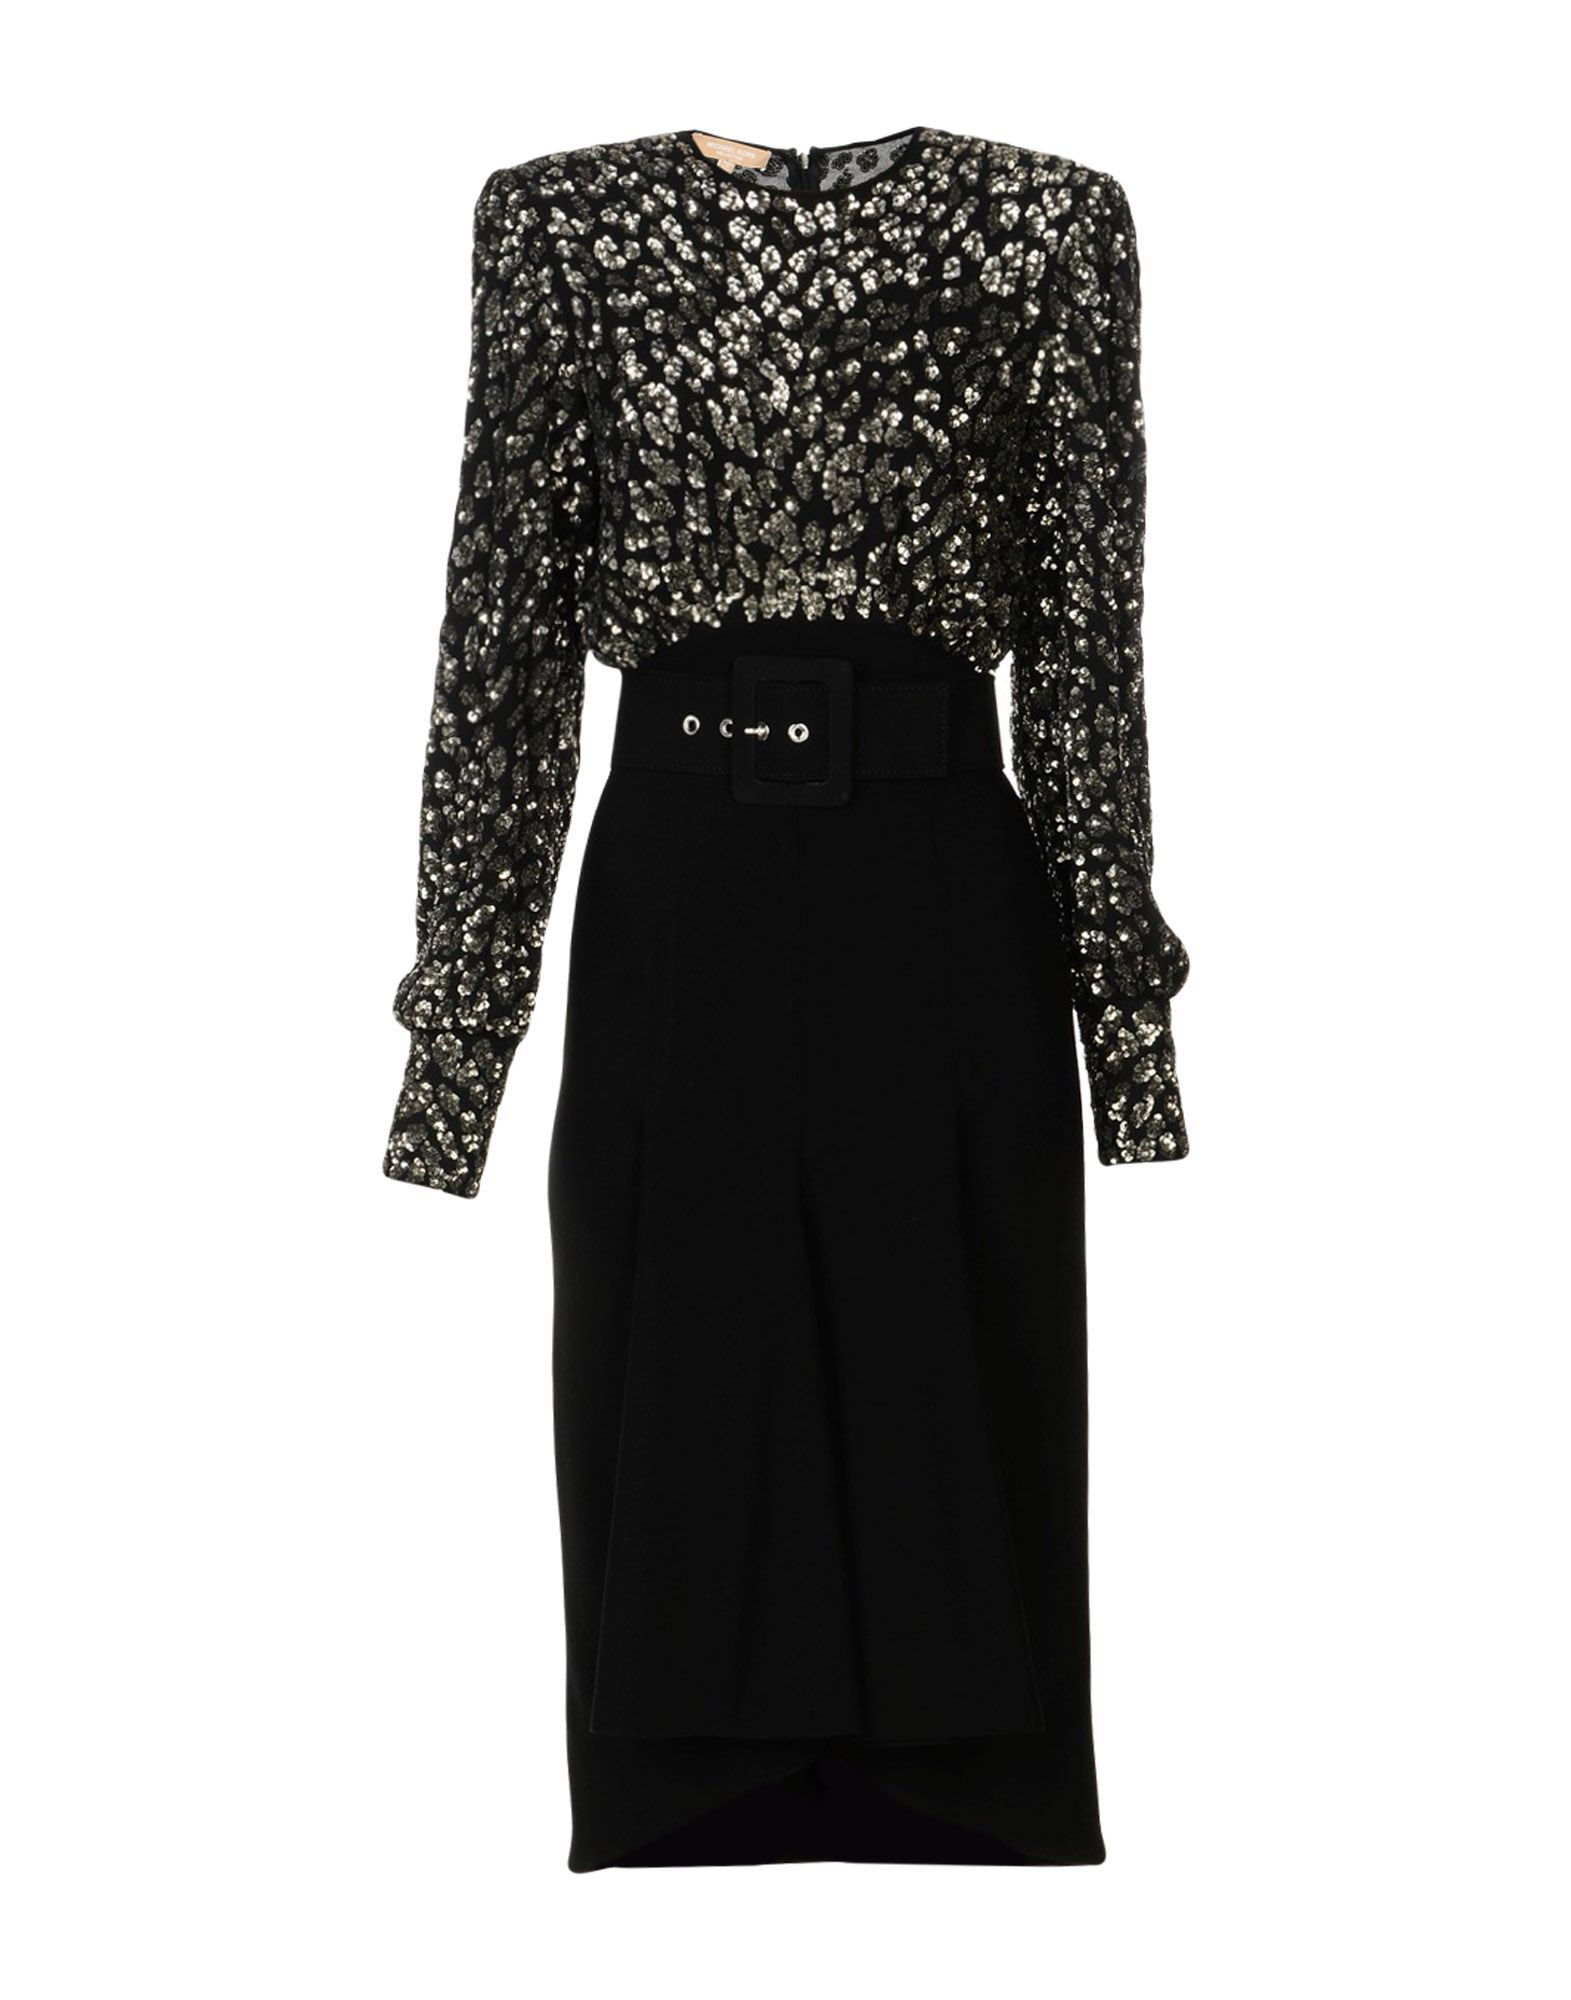 MICHAEL KORS COLLECTION Платье до колена platinor platinor 91750 517